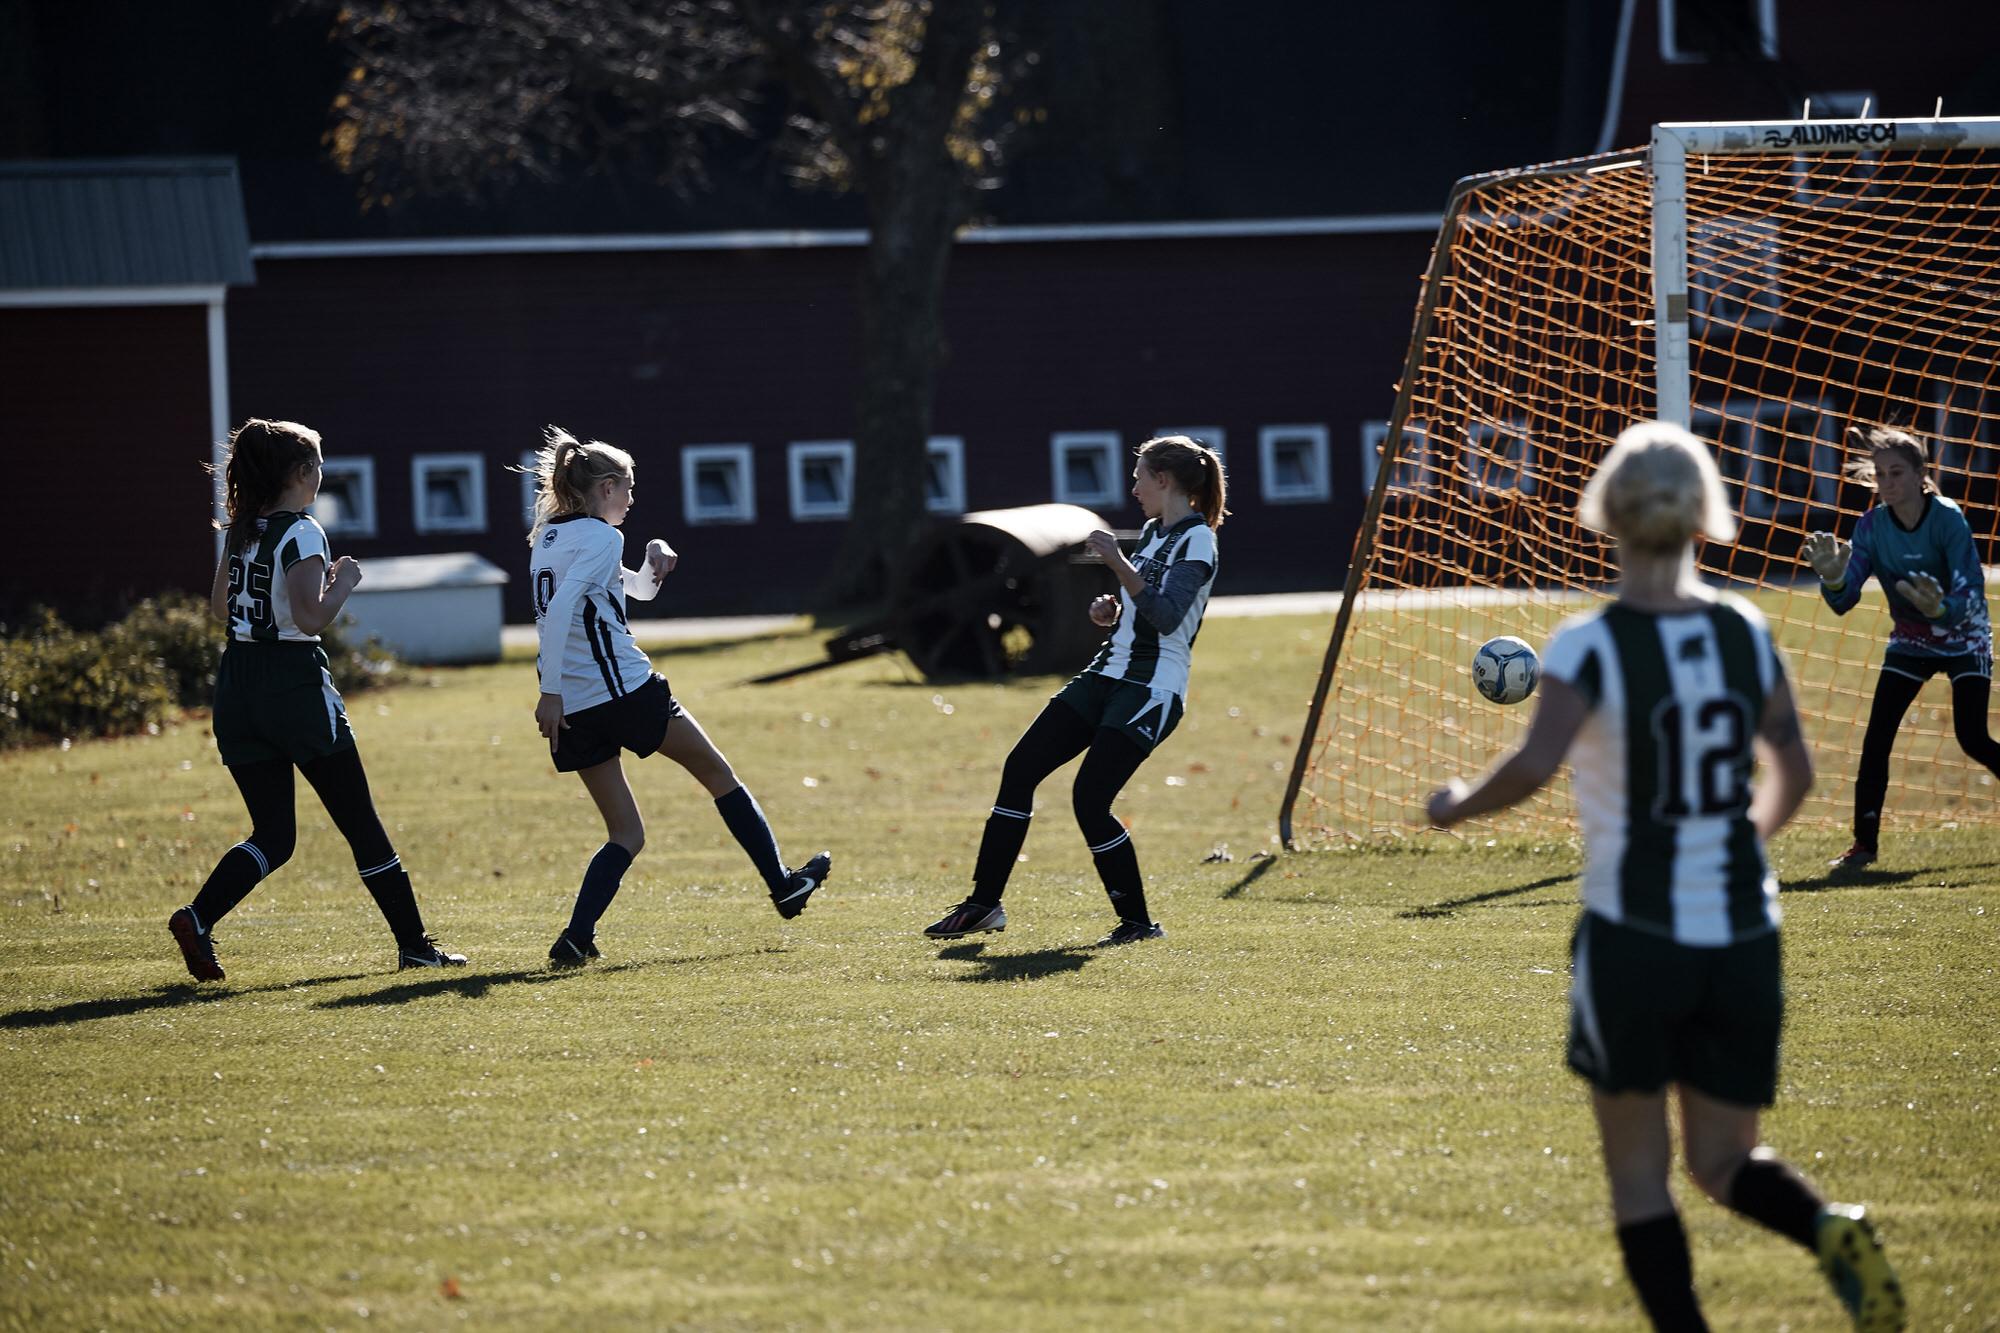 Girls Varsity Soccer vs. Putney School - October 26, 2018 - 006.jpg